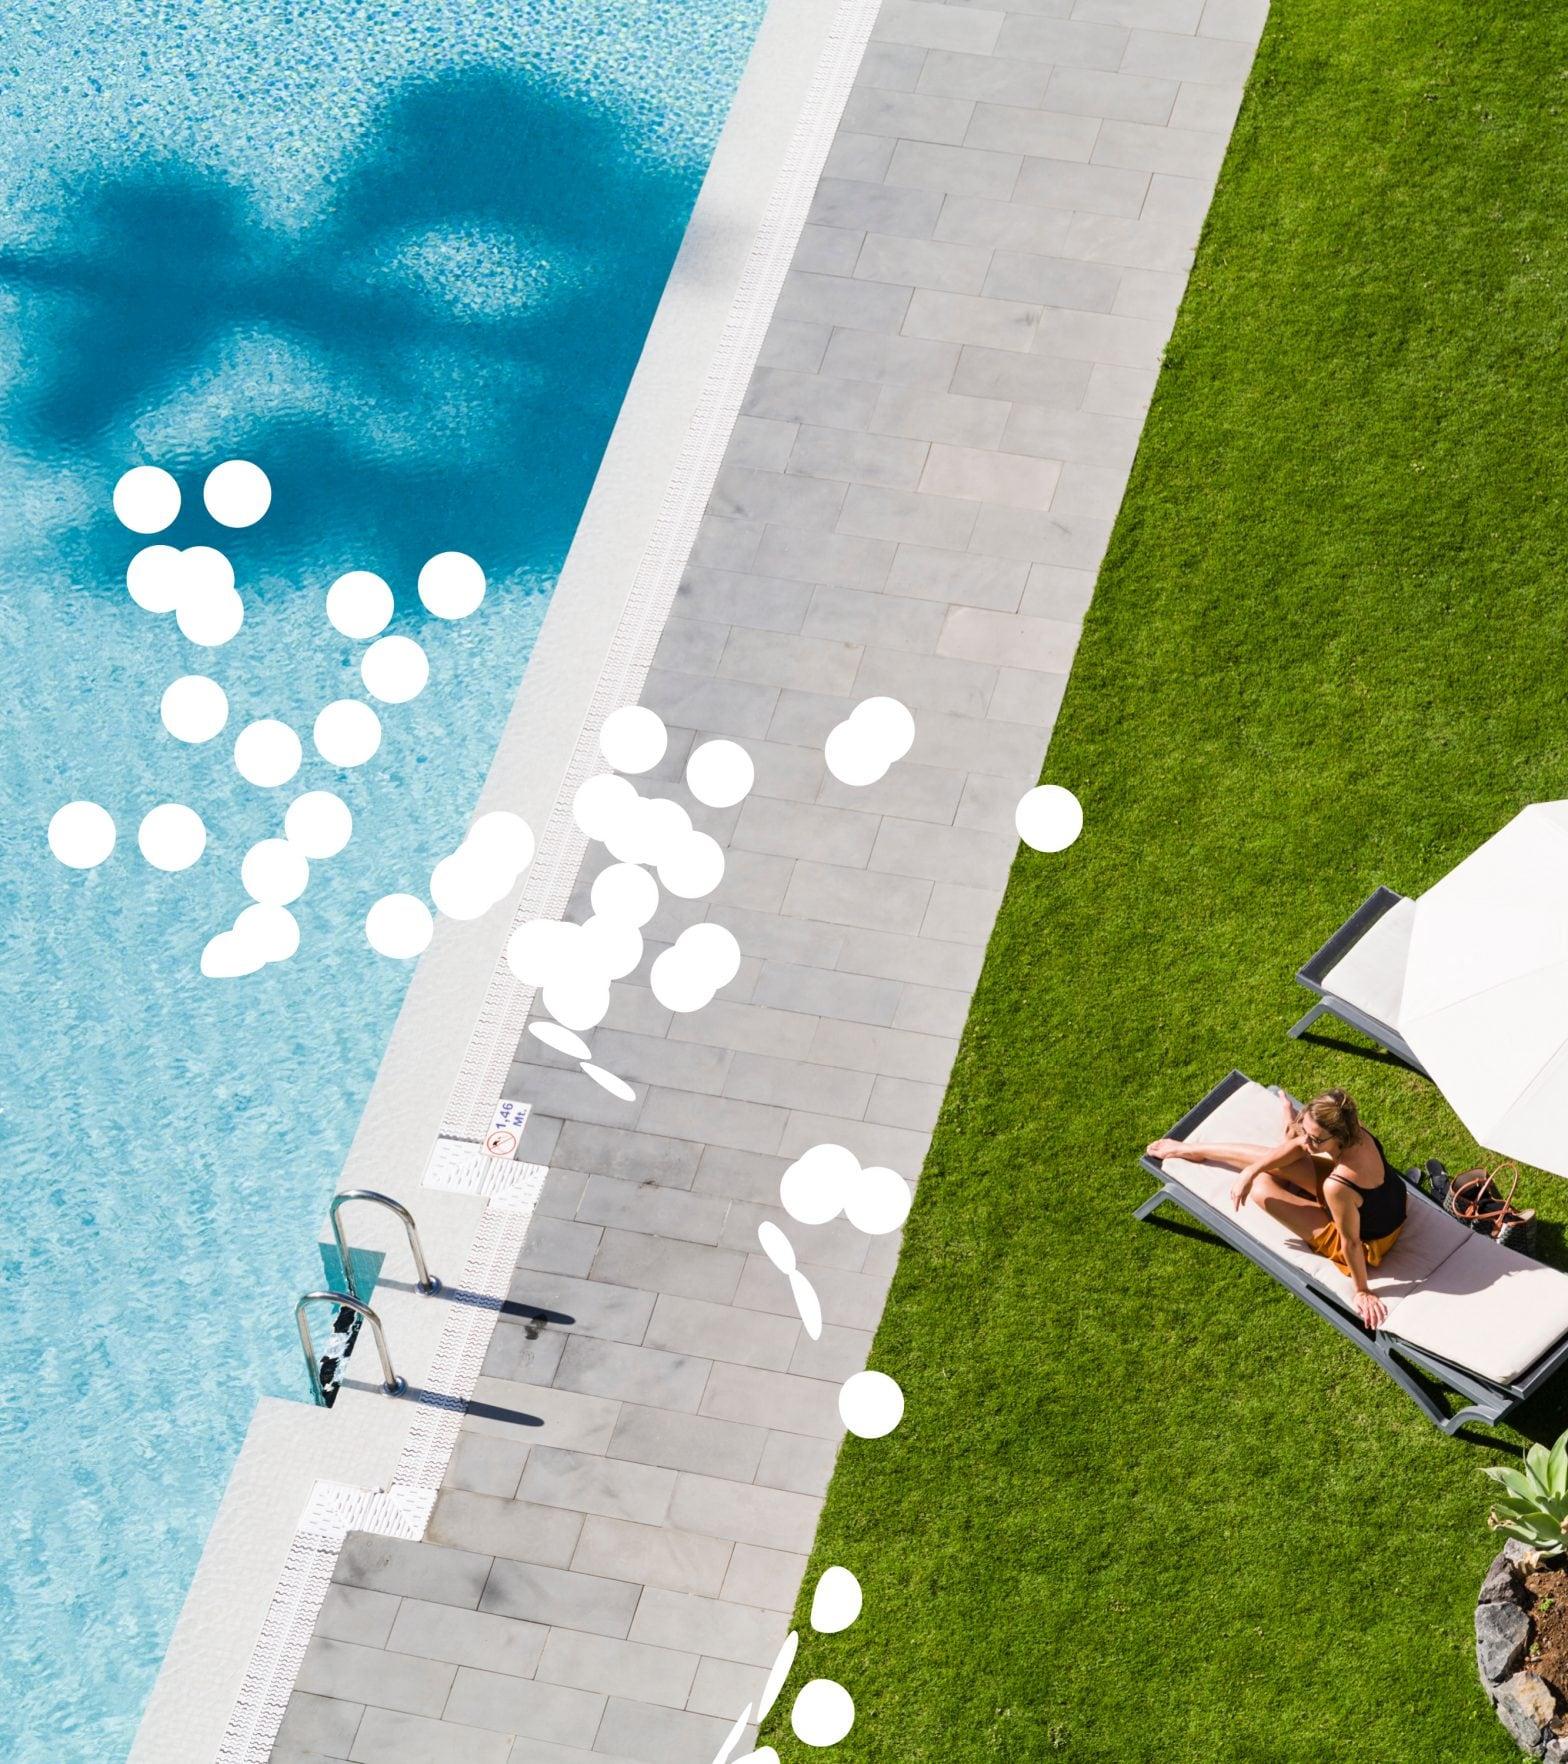 Pool_Liegewiese_Frau_Drohne